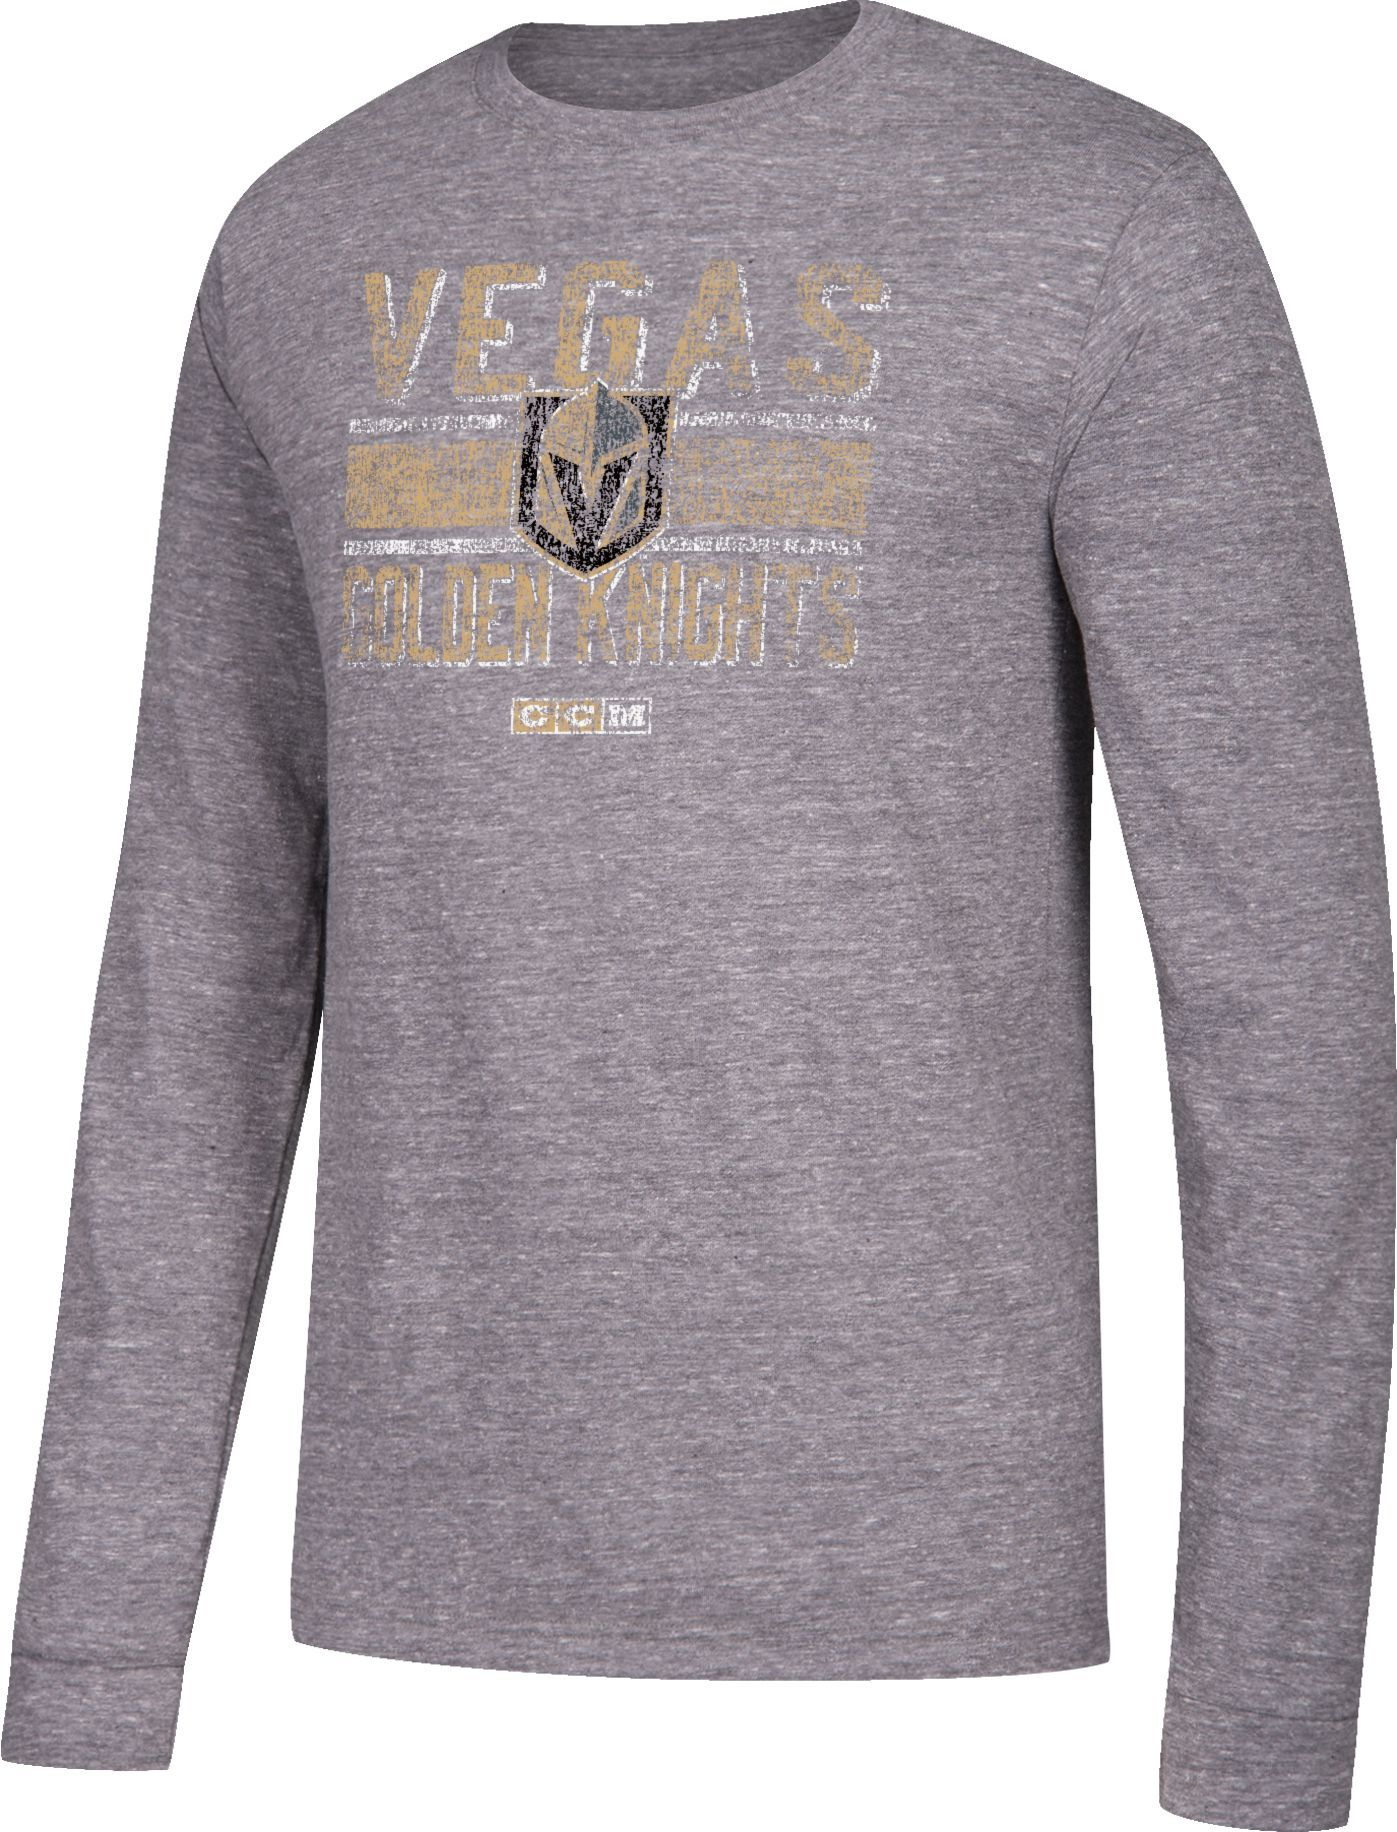 on sale 0e7c6 74897 CCM Men's Vegas Golden Knights Line Brawl Grey Long Sleeve ...